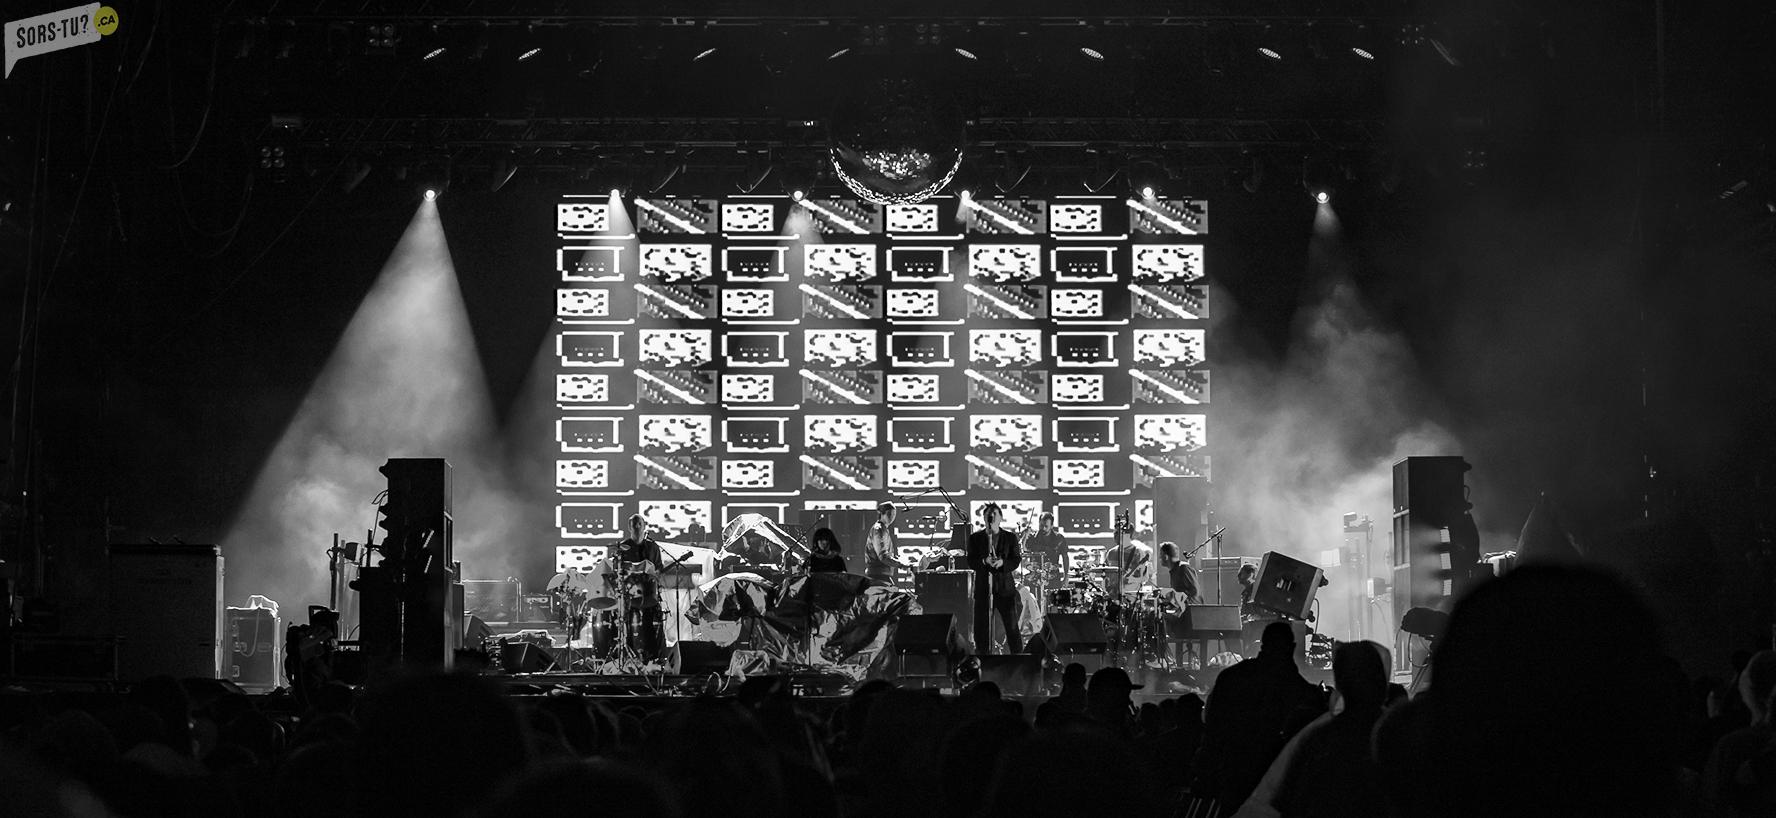 LCDSoundsystem-Rbcbluesfest-Ottawa-Sorstuca-2017-1